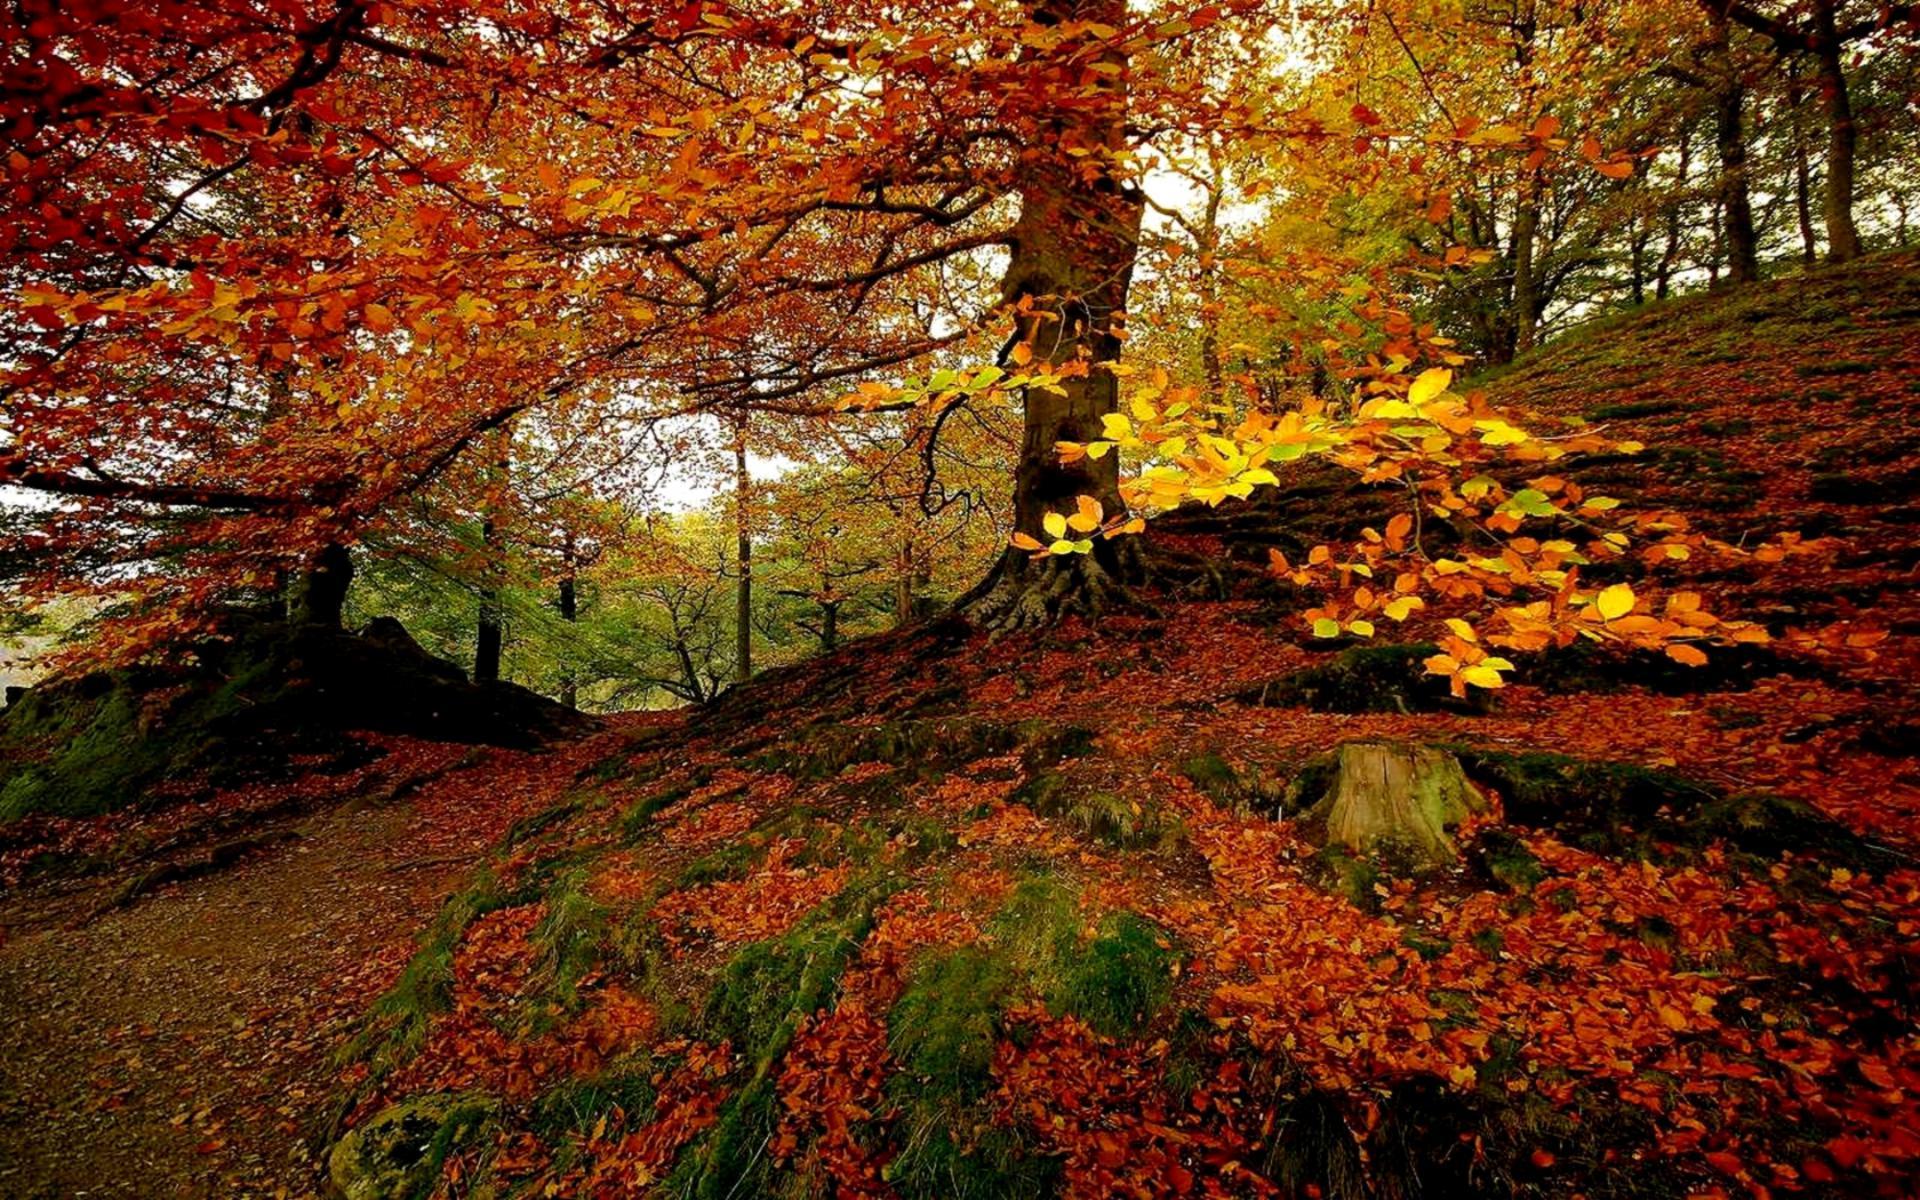 Autumn Fall Wallpaper 1600x900 Sfondi Desktop Natura Download Gratis